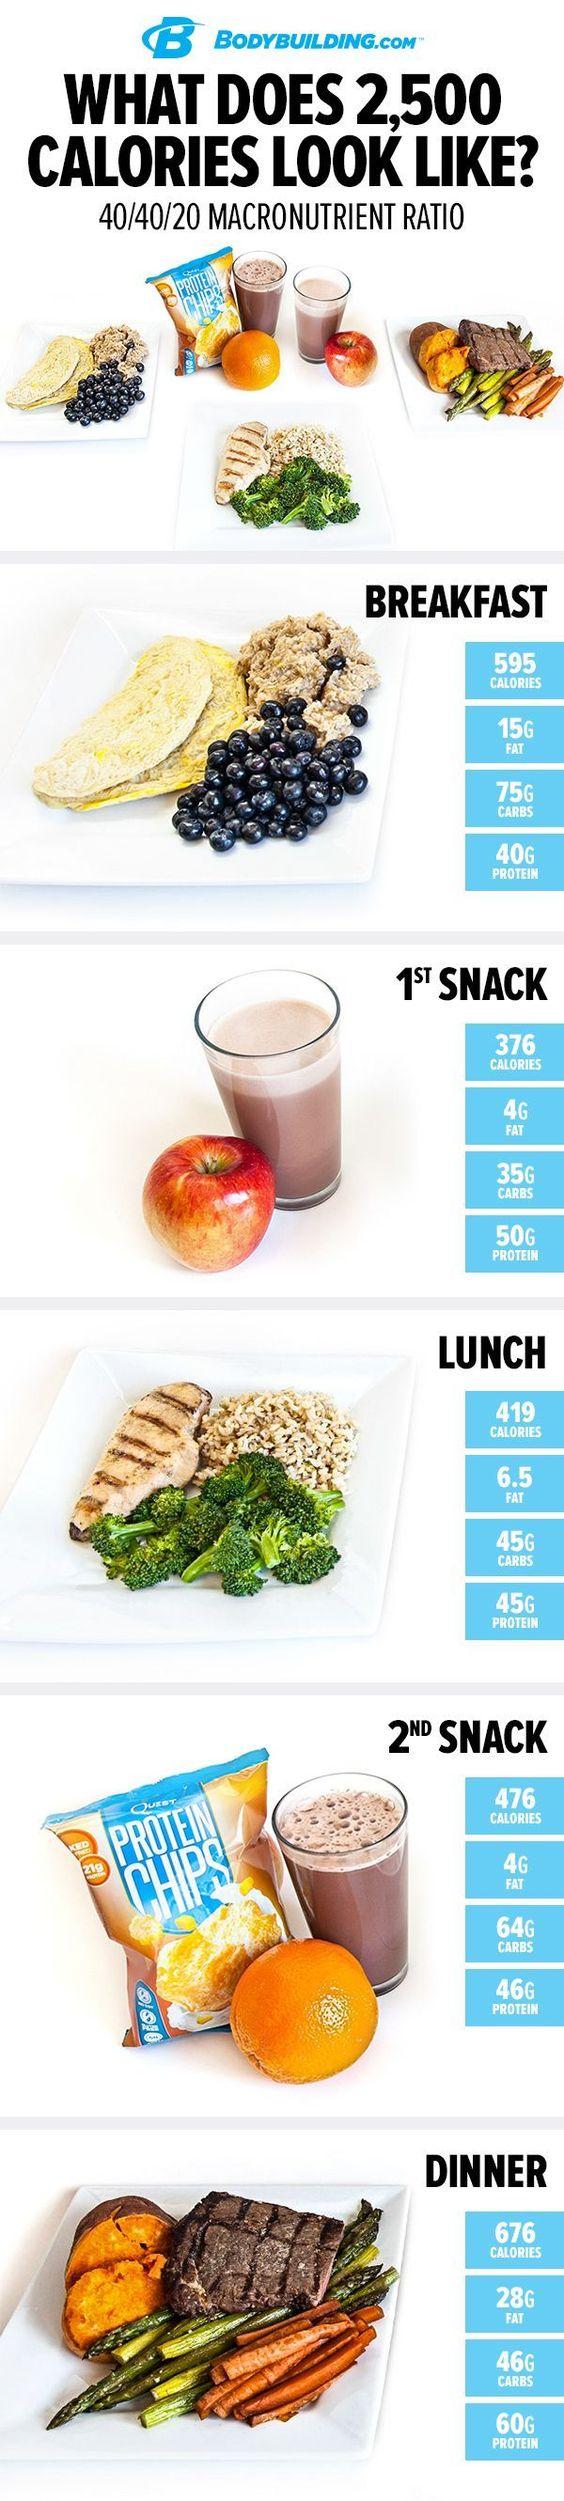 Calorias de dieta diaria 2500